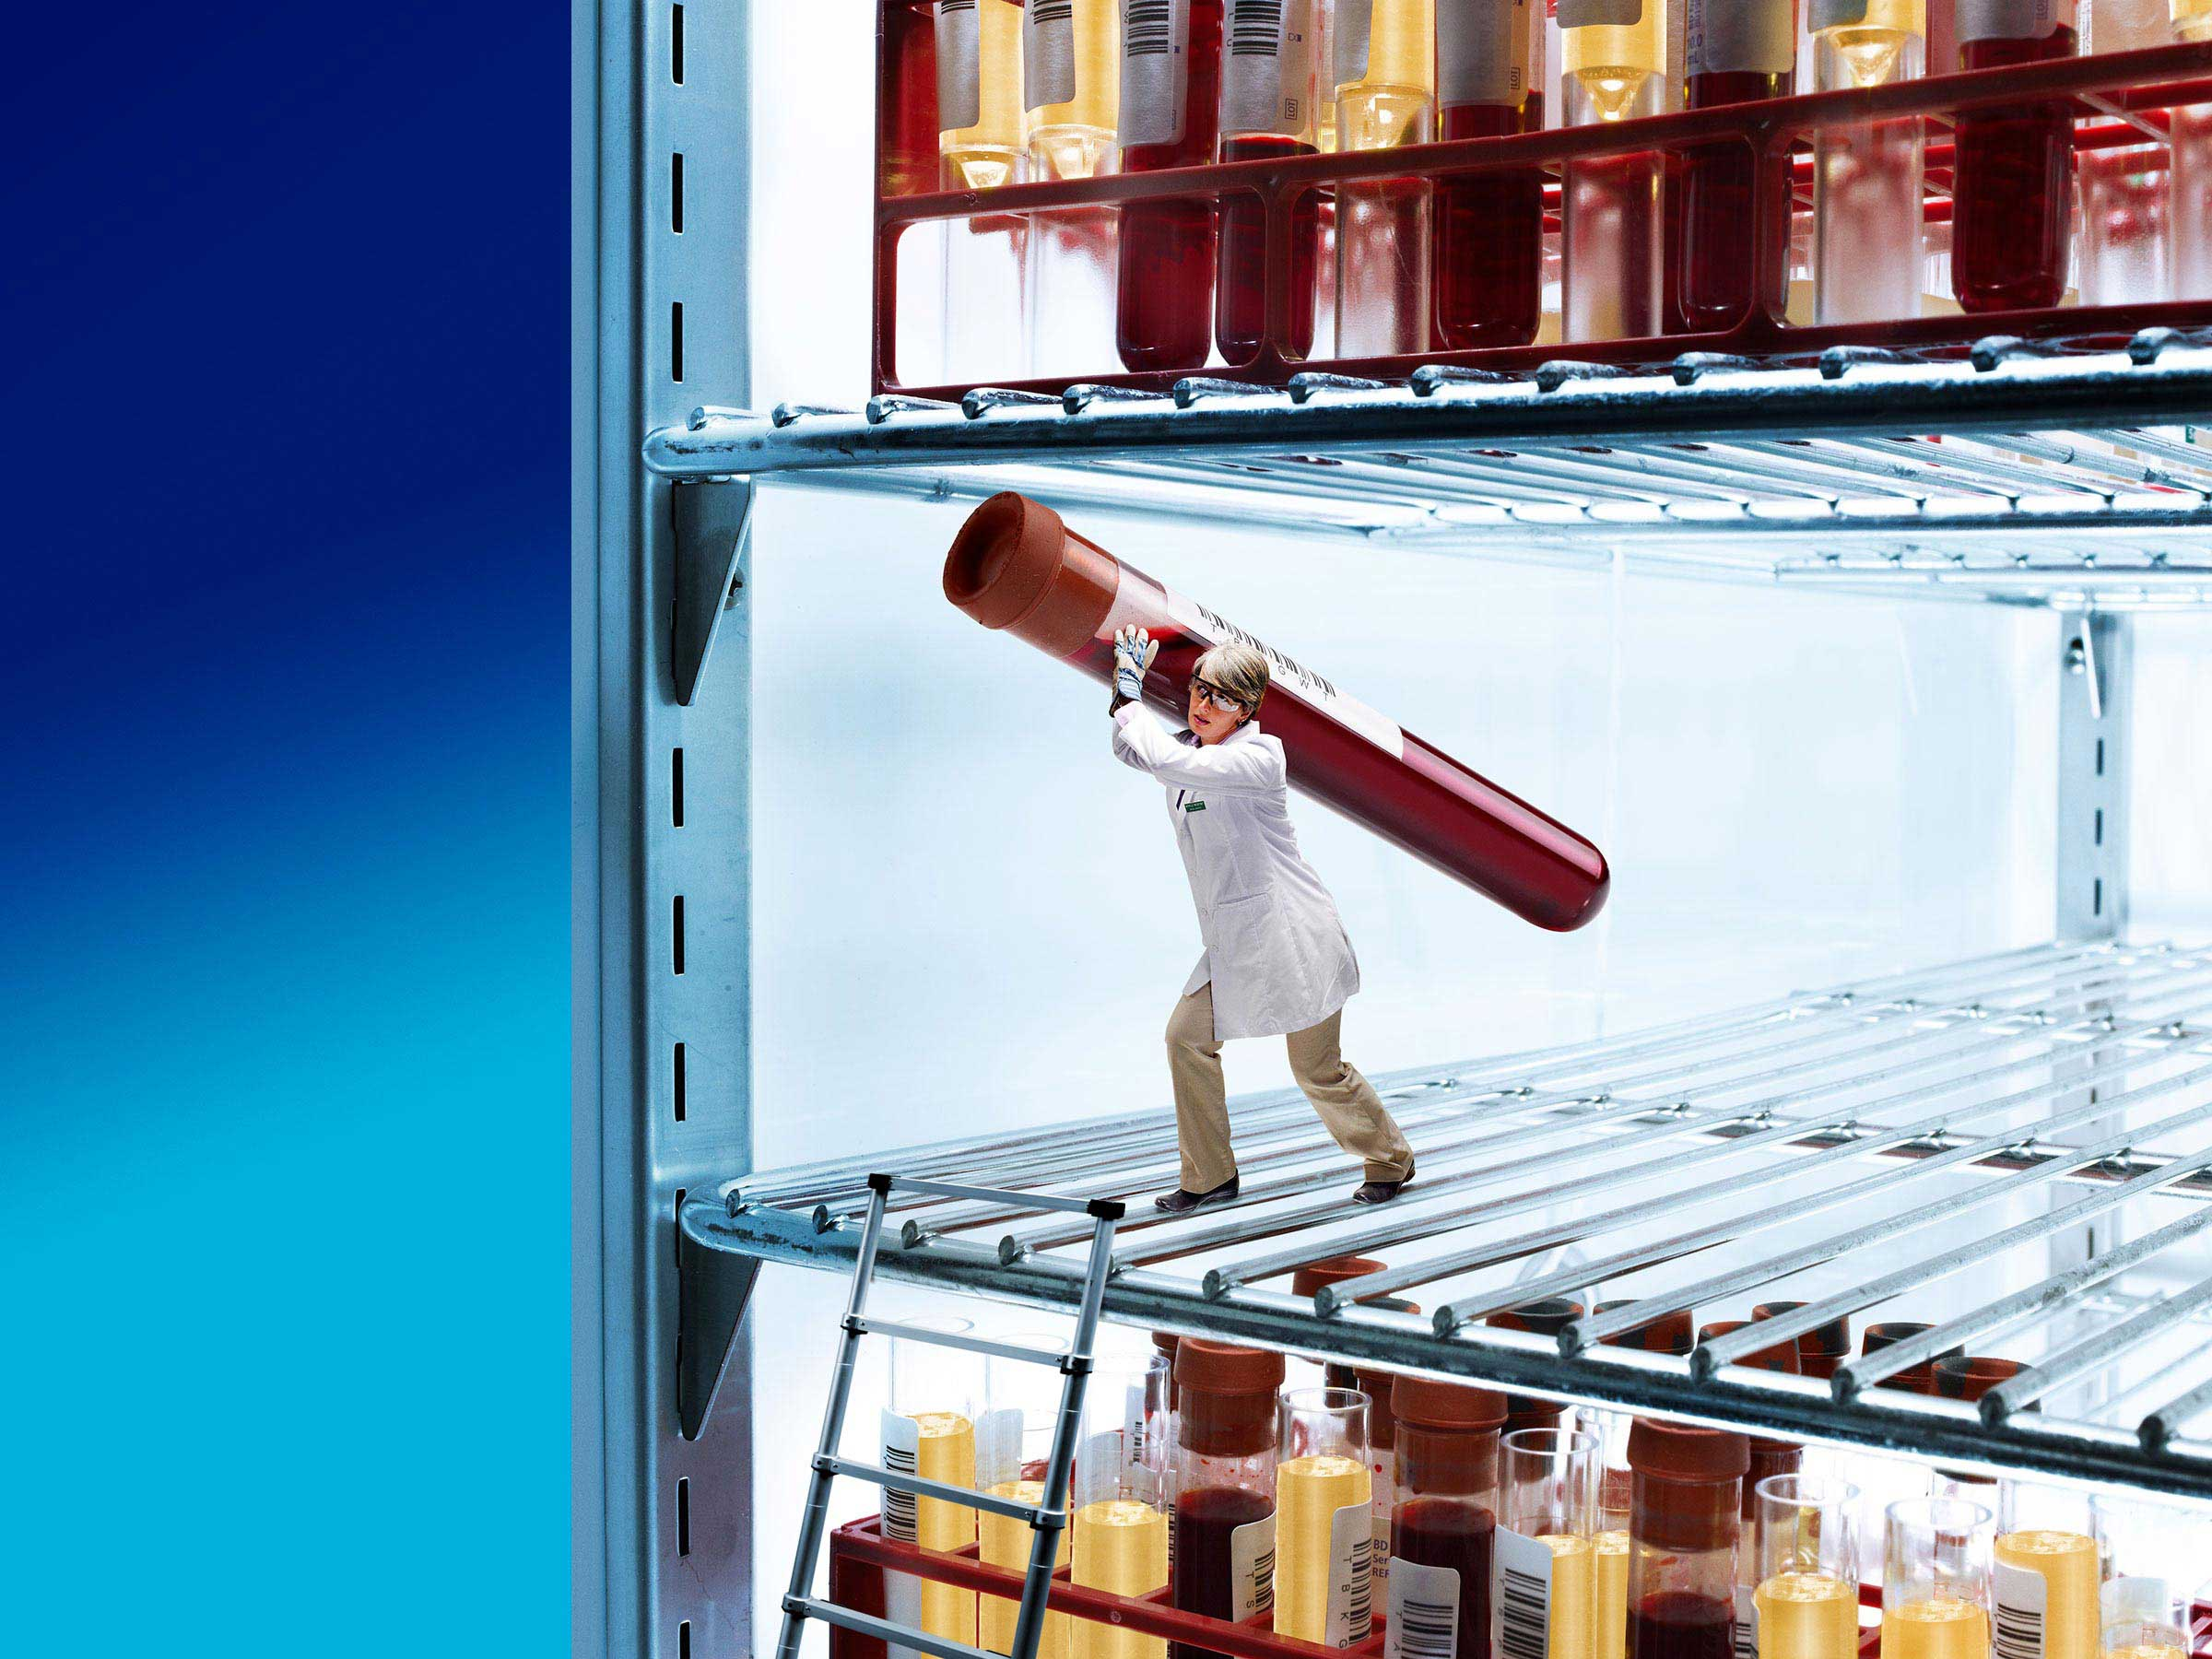 tiny-woman-in-fridge-carrying-testtube.jpg